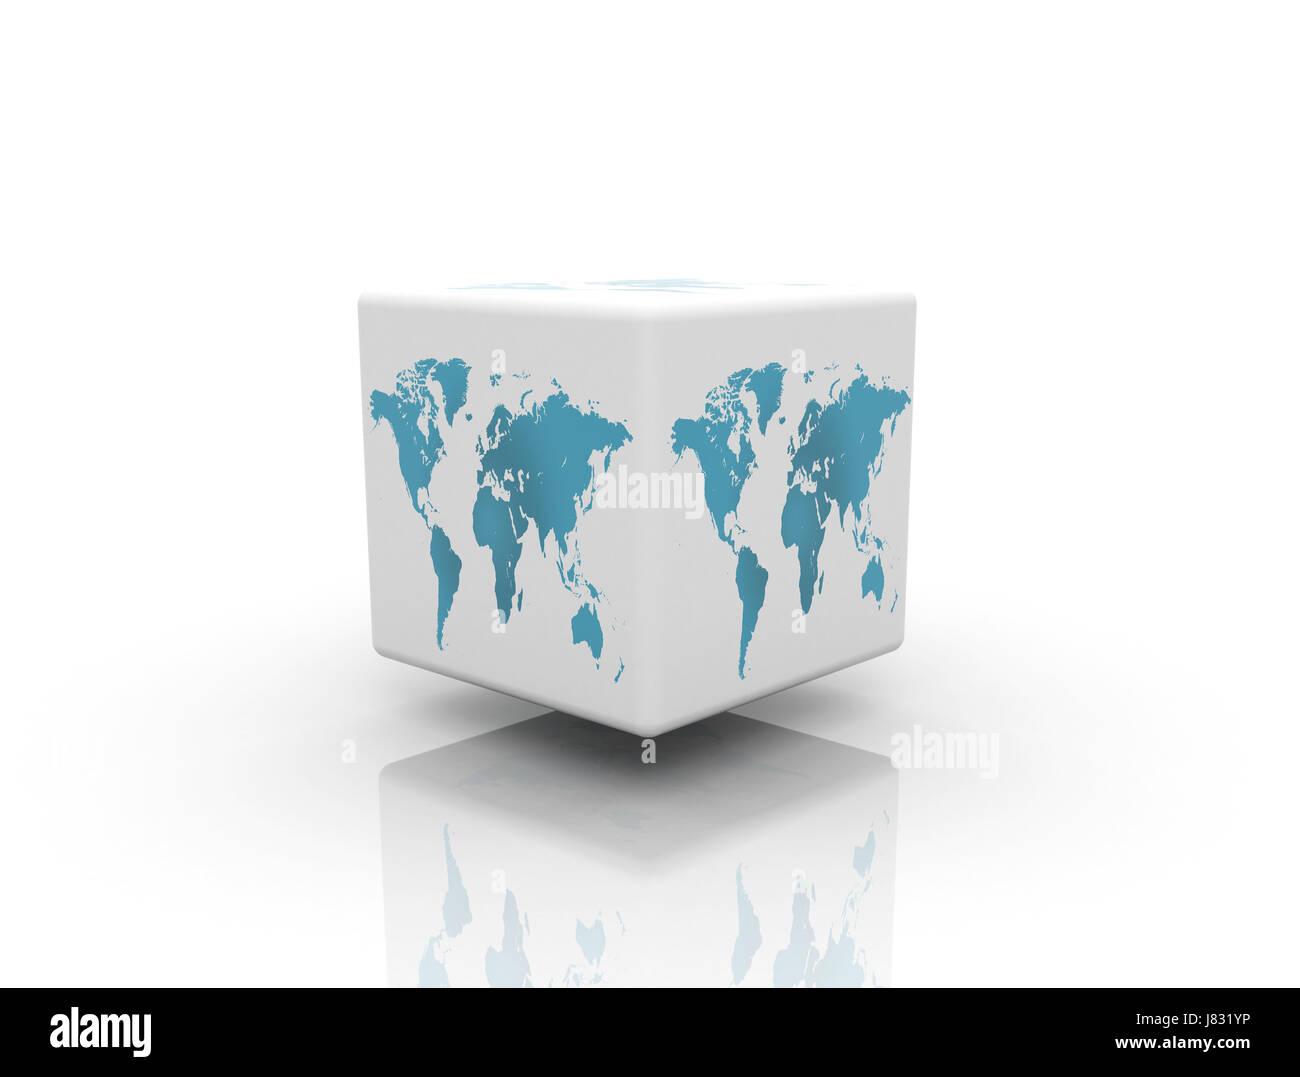 Digital box boxes cube globe planet earth world global map atlas digital box boxes cube globe planet earth world global map atlas map of the sciox Gallery